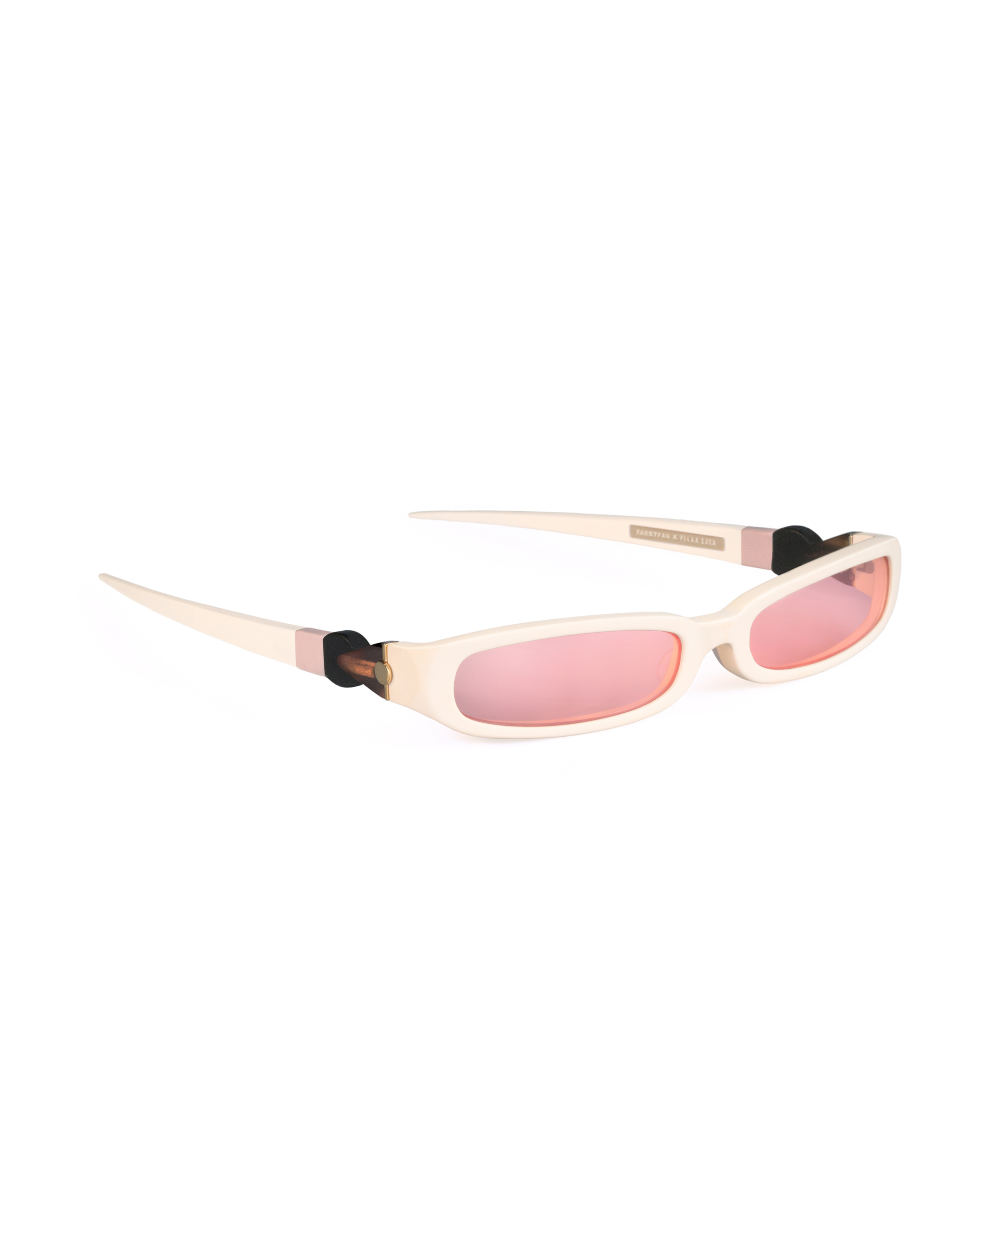 GRACE. Sunglasses. Glossy Ivory & Pink